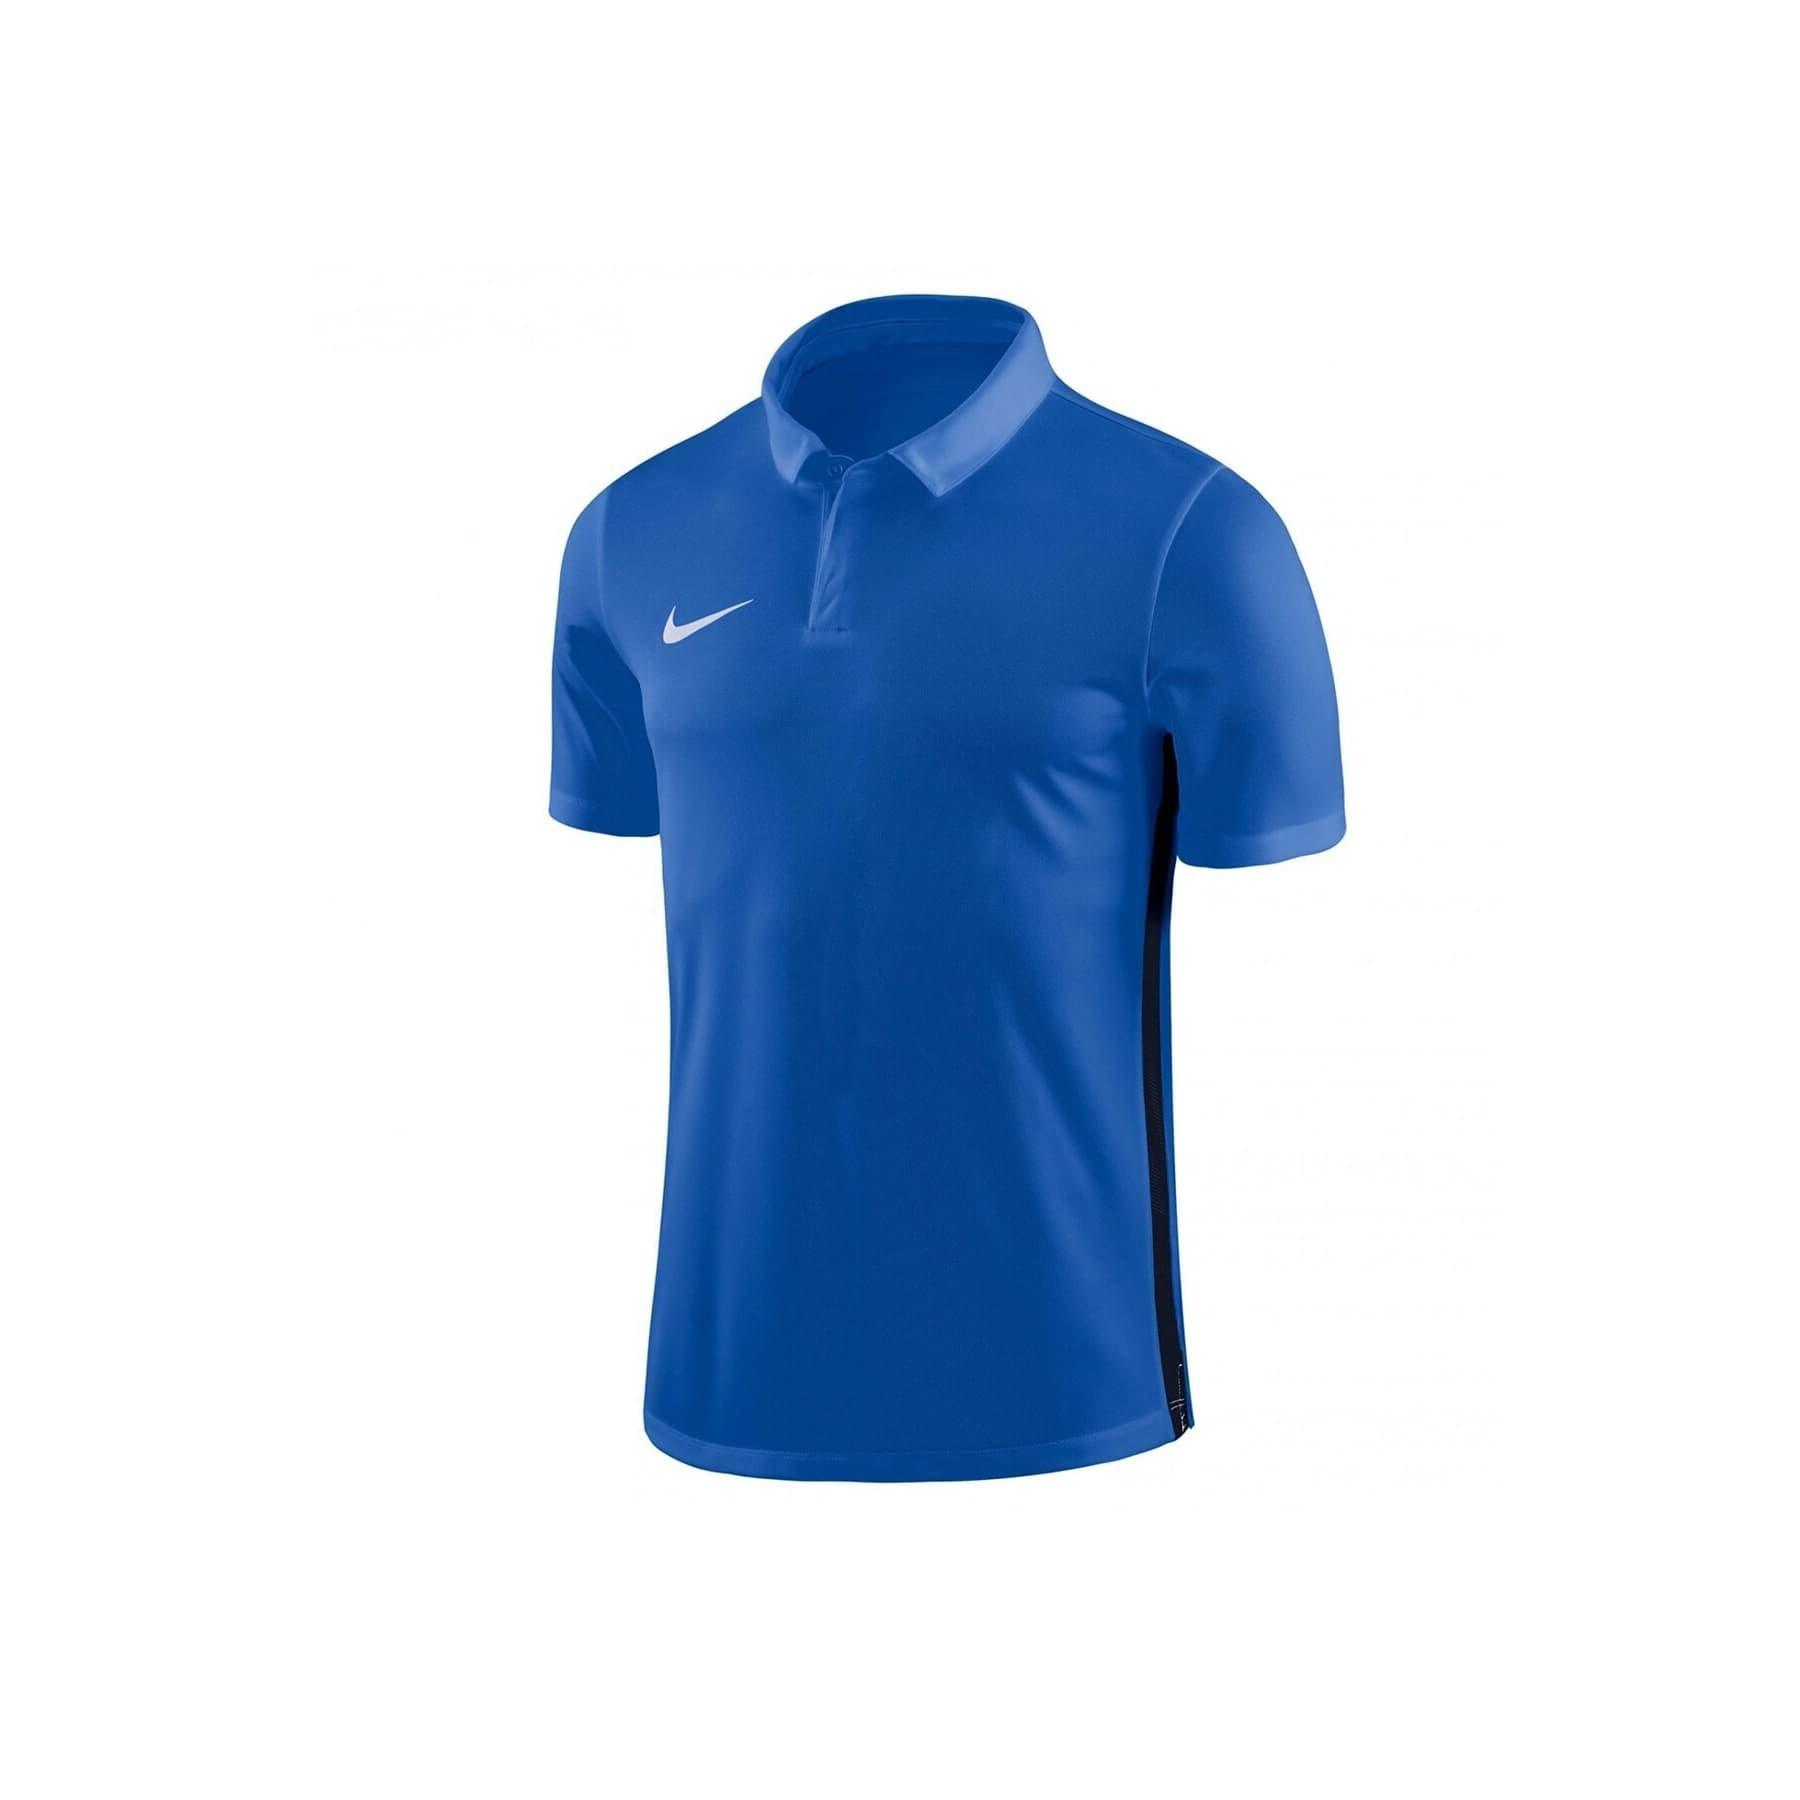 Dry Academy 18 Erkek Mavi Polo Tişört (899984-463)